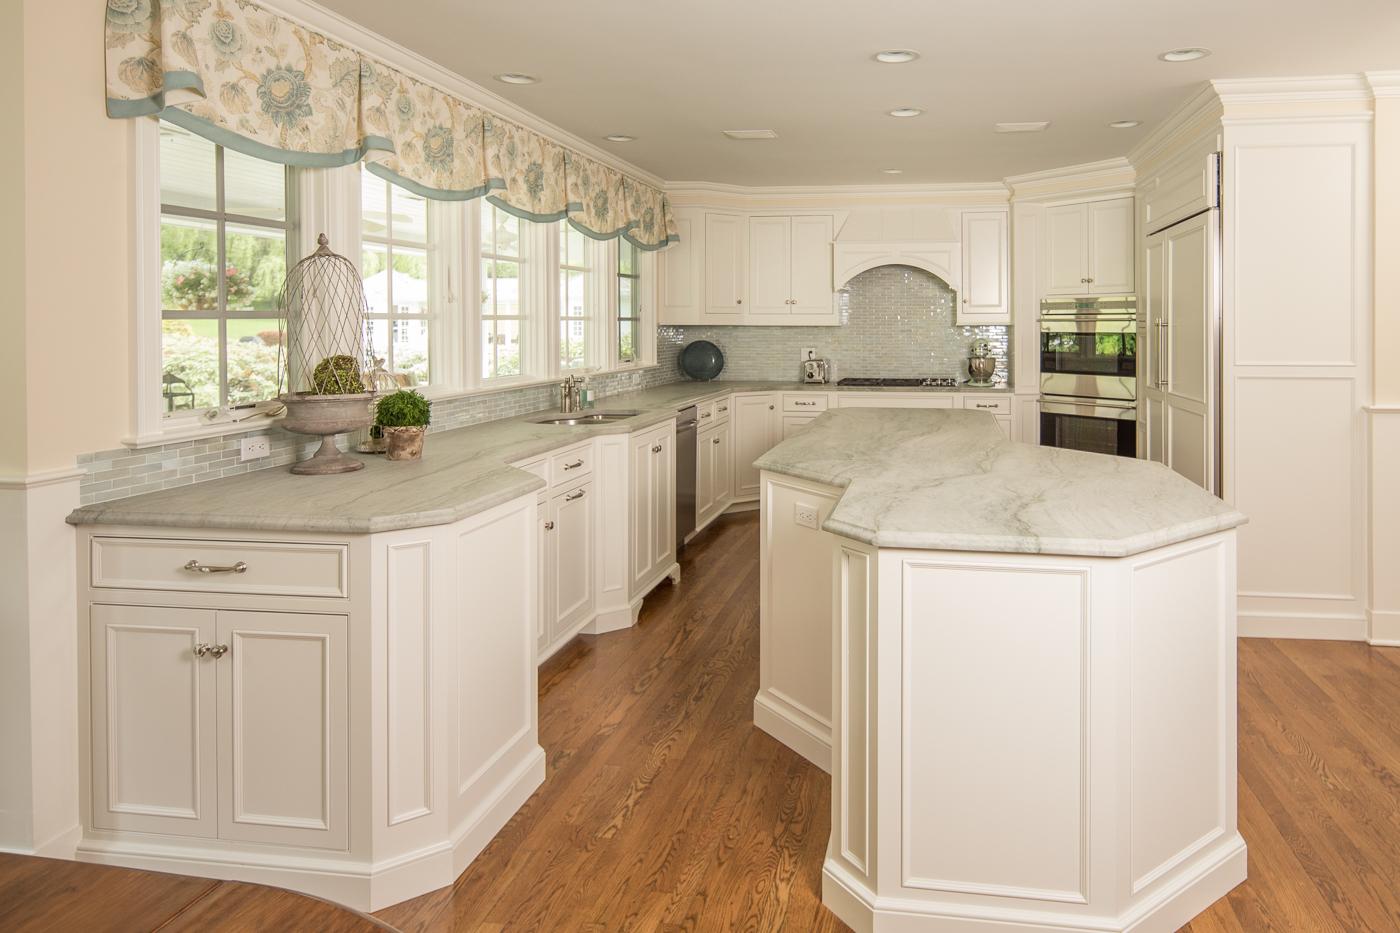 ackleycabinet cabinets for kitchen Custom cabinets kitchen design Ackley Cabinet Ridgfield CT